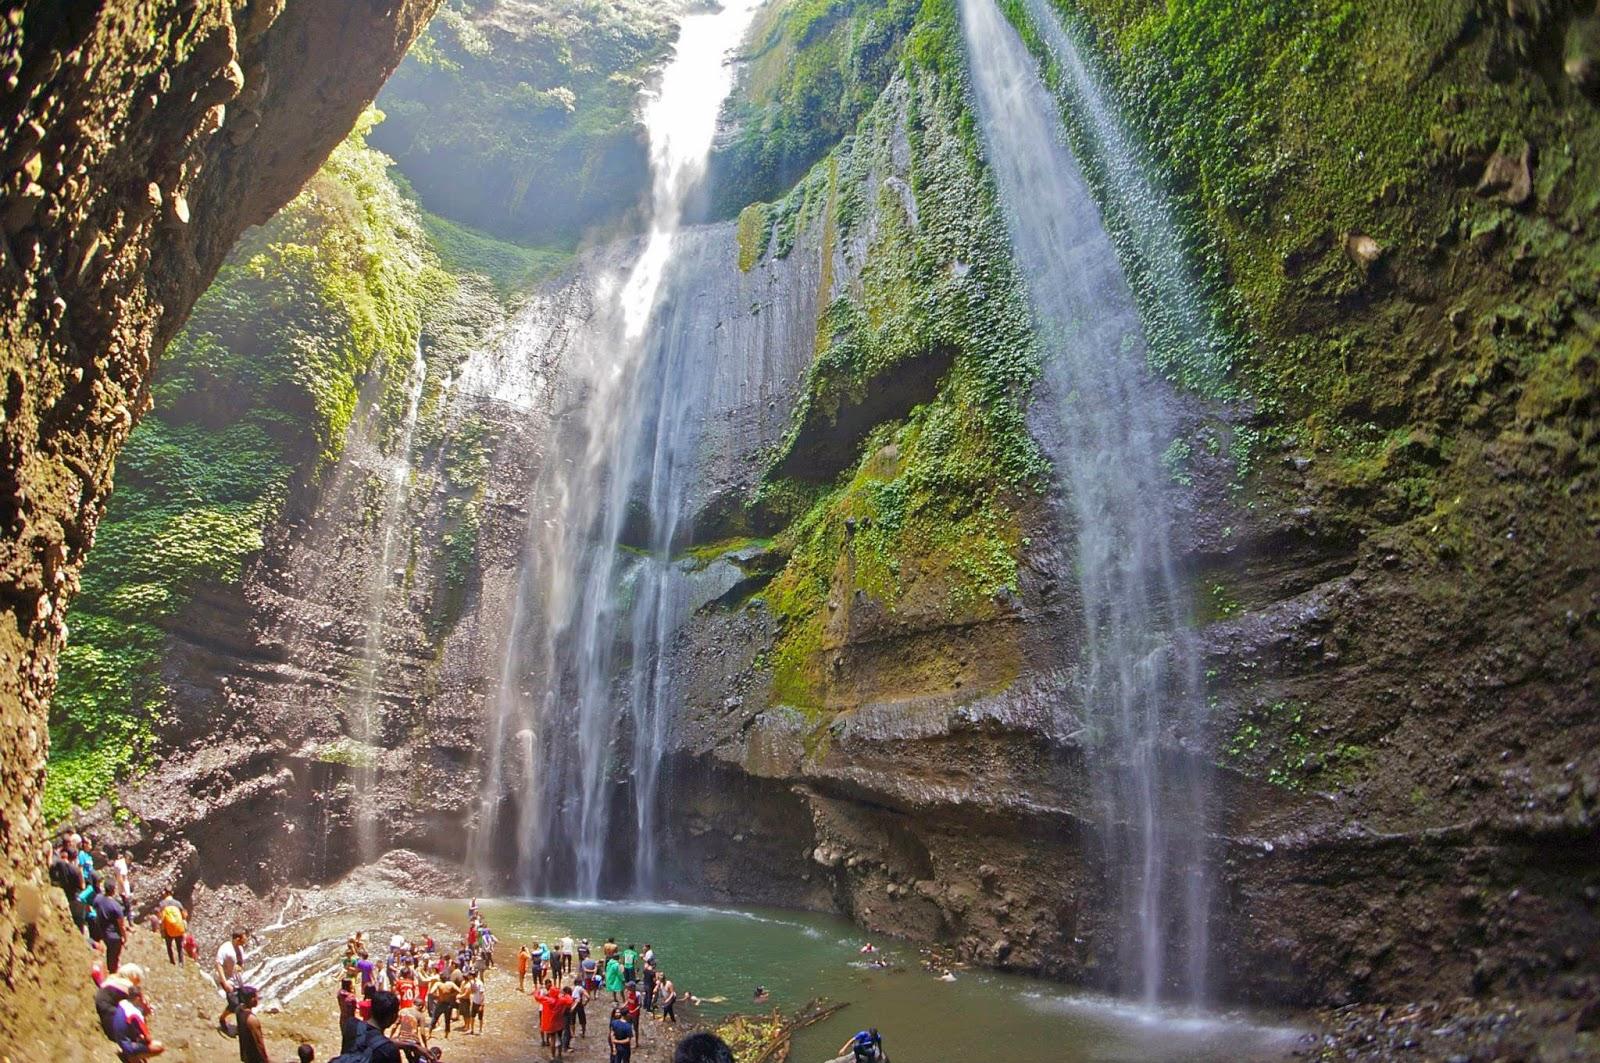 Daftar Wisata di Probolinggo